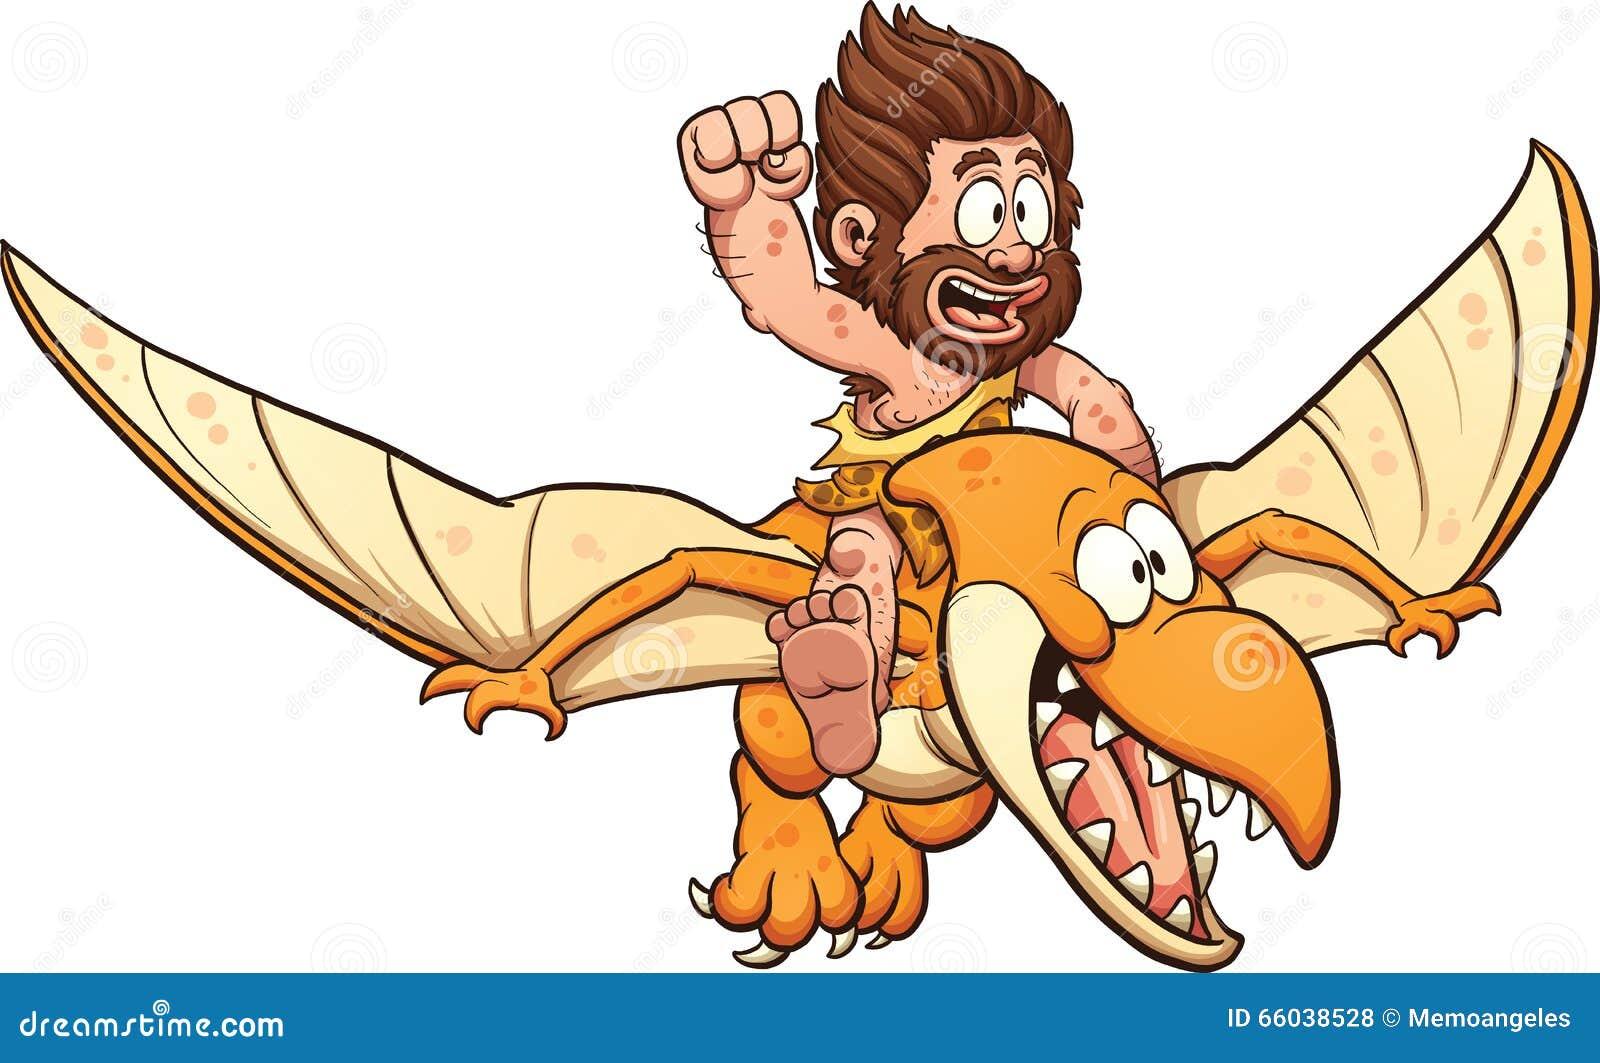 Cartoon caveman riding a pterodactyl. Vector clip art illustration ...